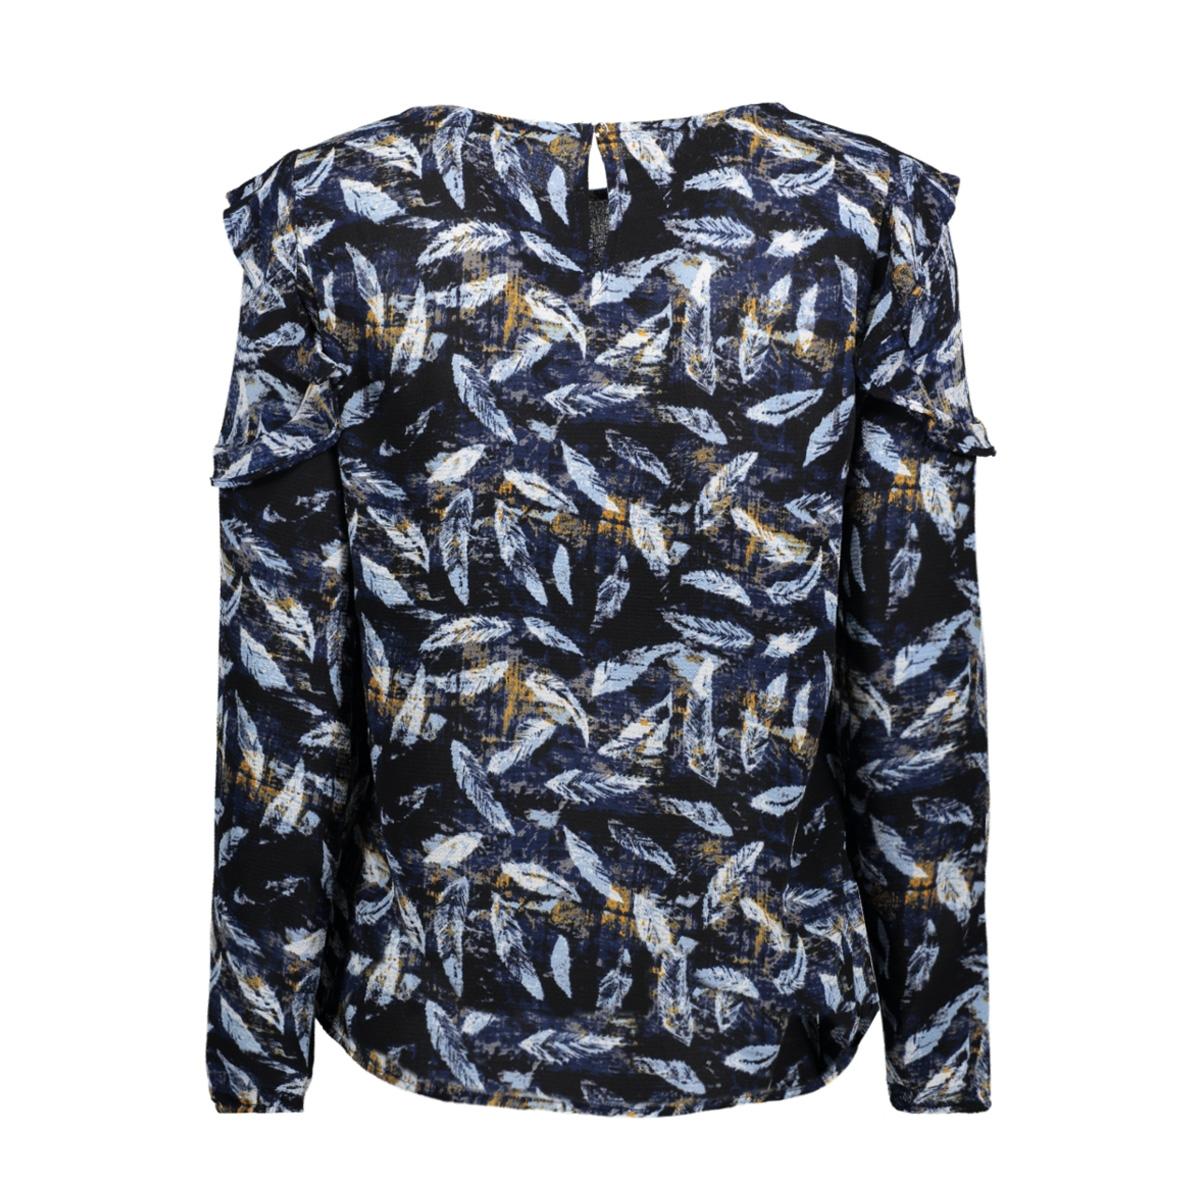 2055132.00.71 tom tailor blouse 1000